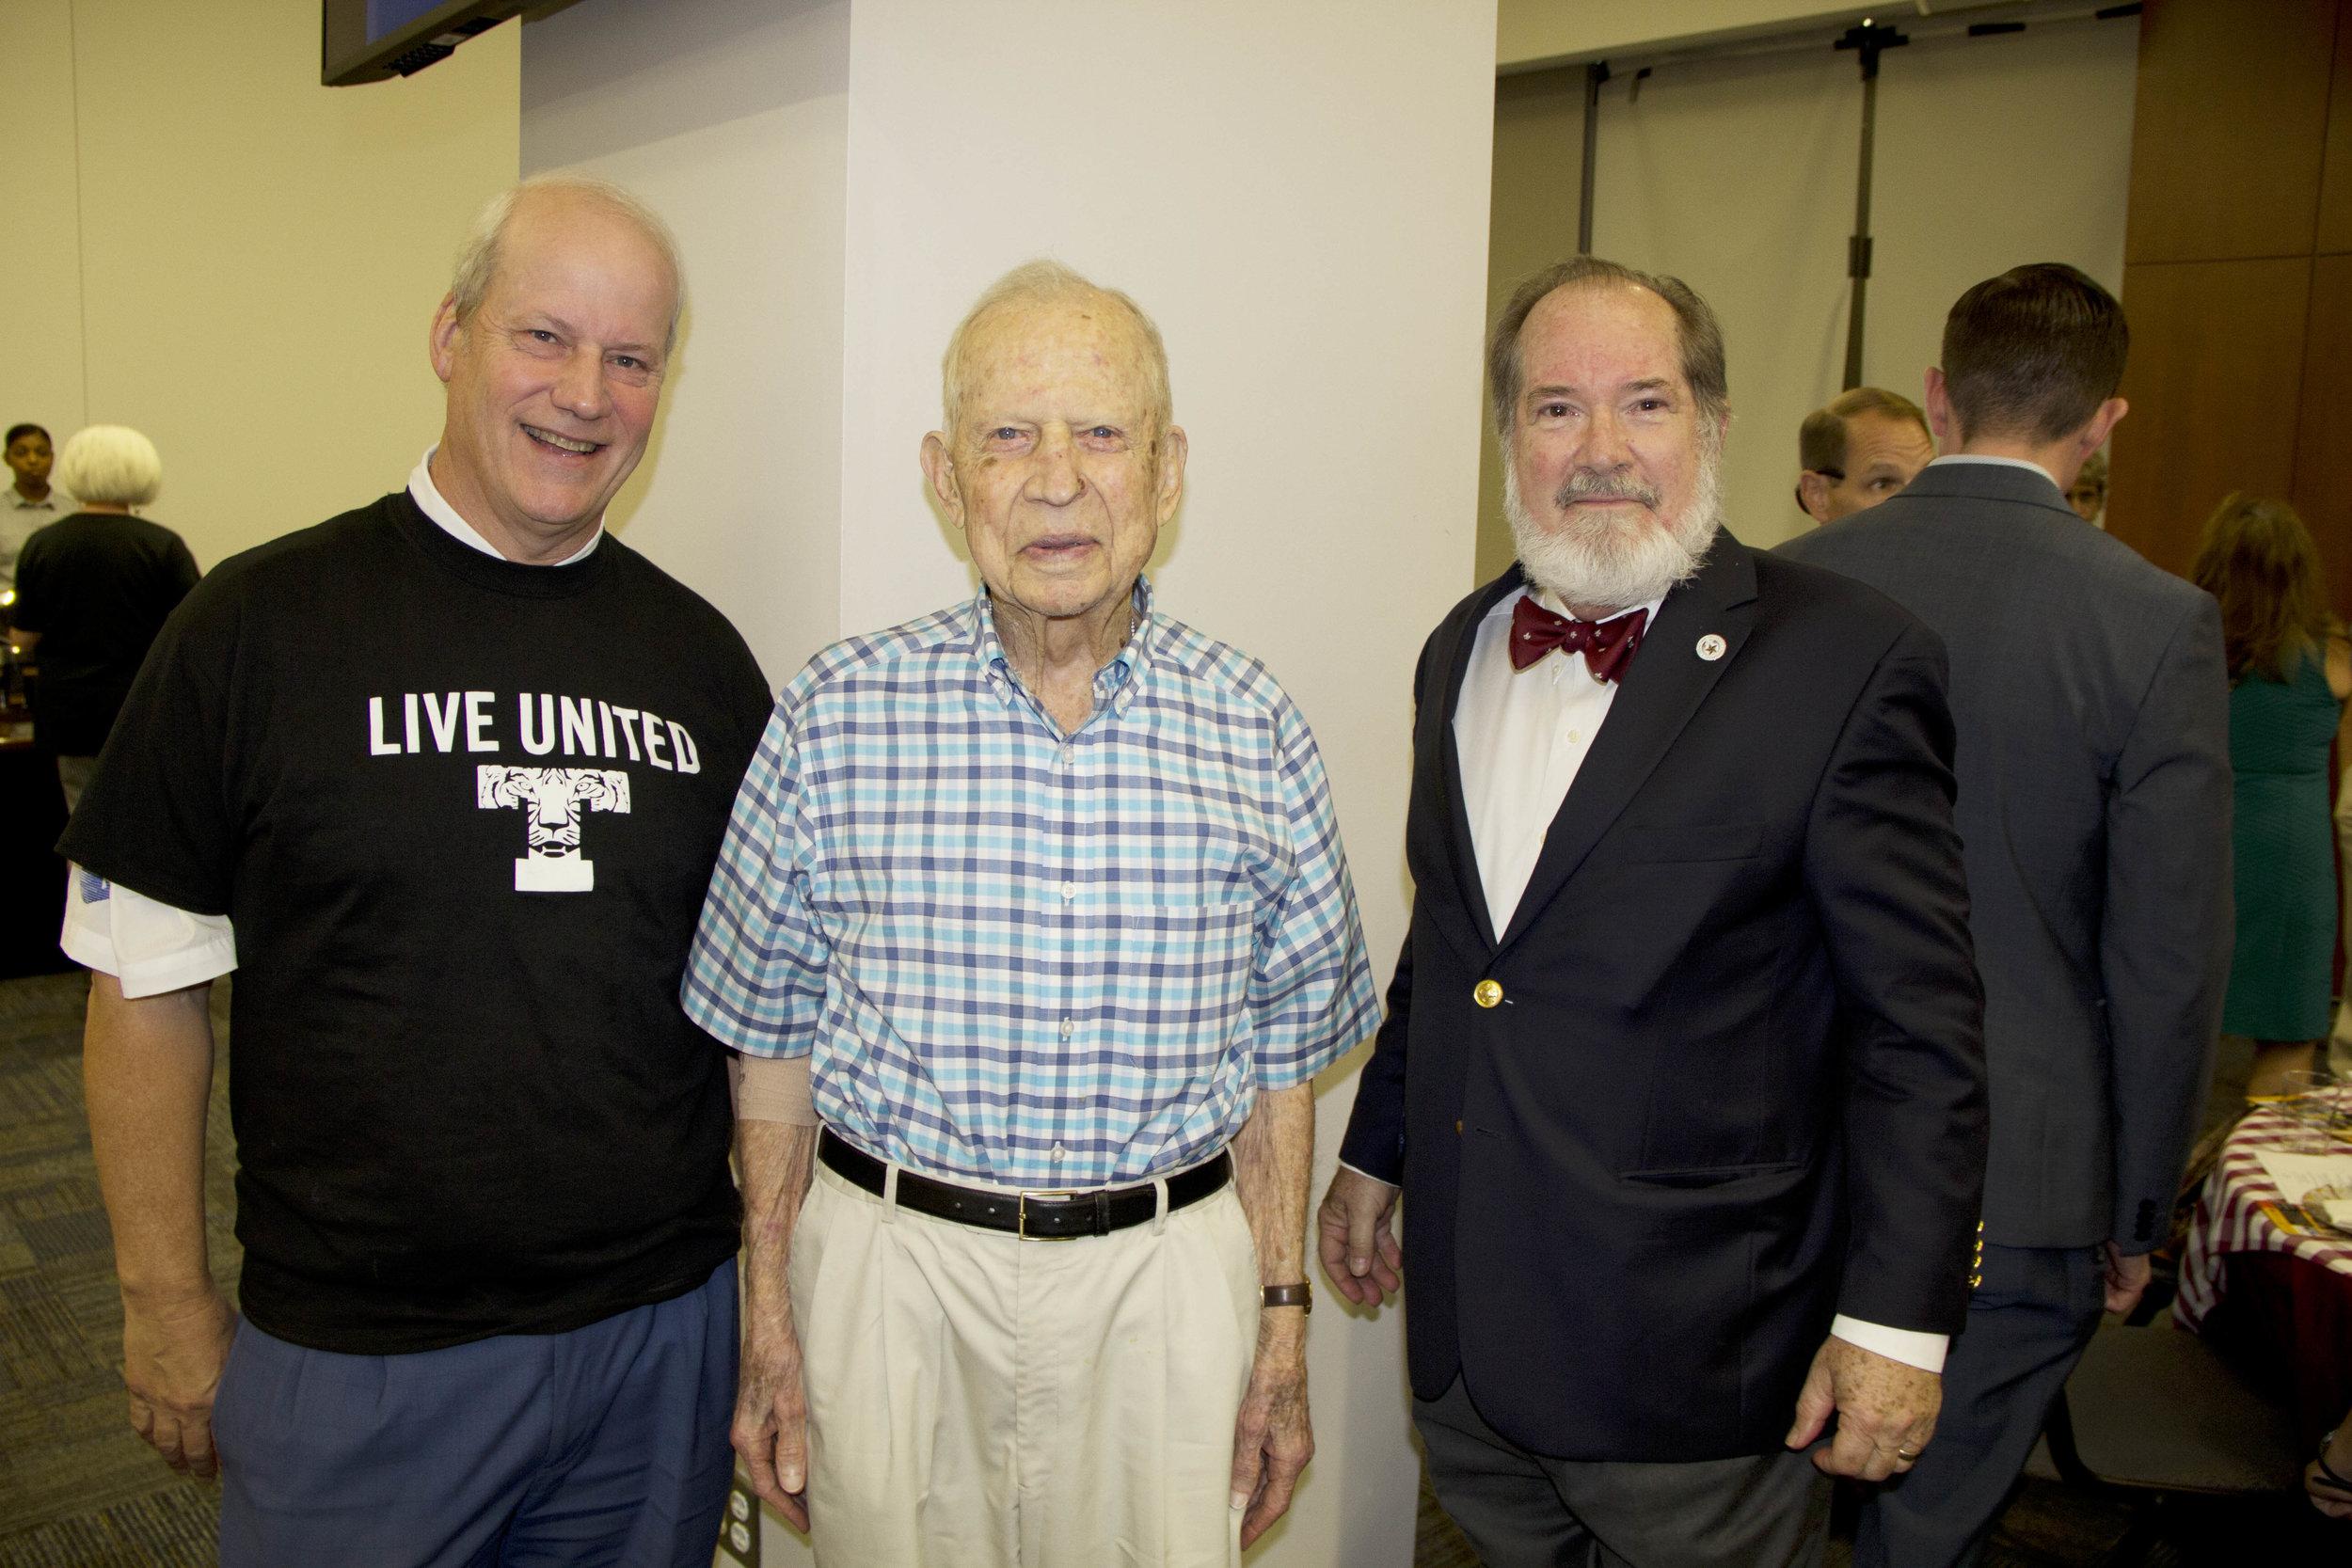 William Morriss, Josh Morriss, Jr. and Dr. Thomas Cutrer